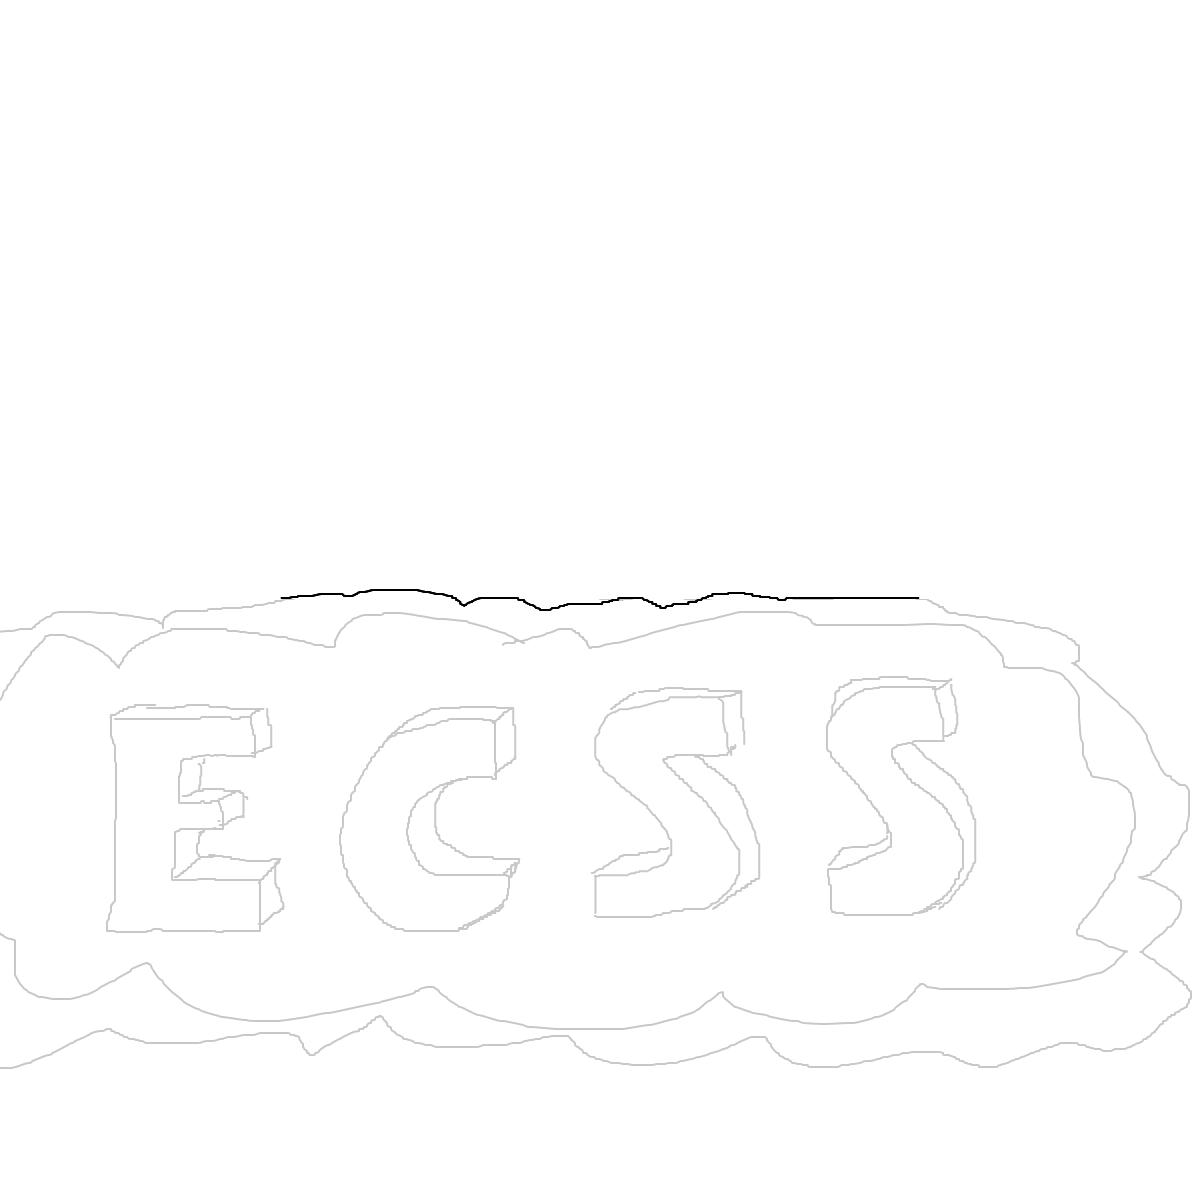 BAAAM drawing#22926 lat:50.9374694824218750lng: -1.3984297513961792